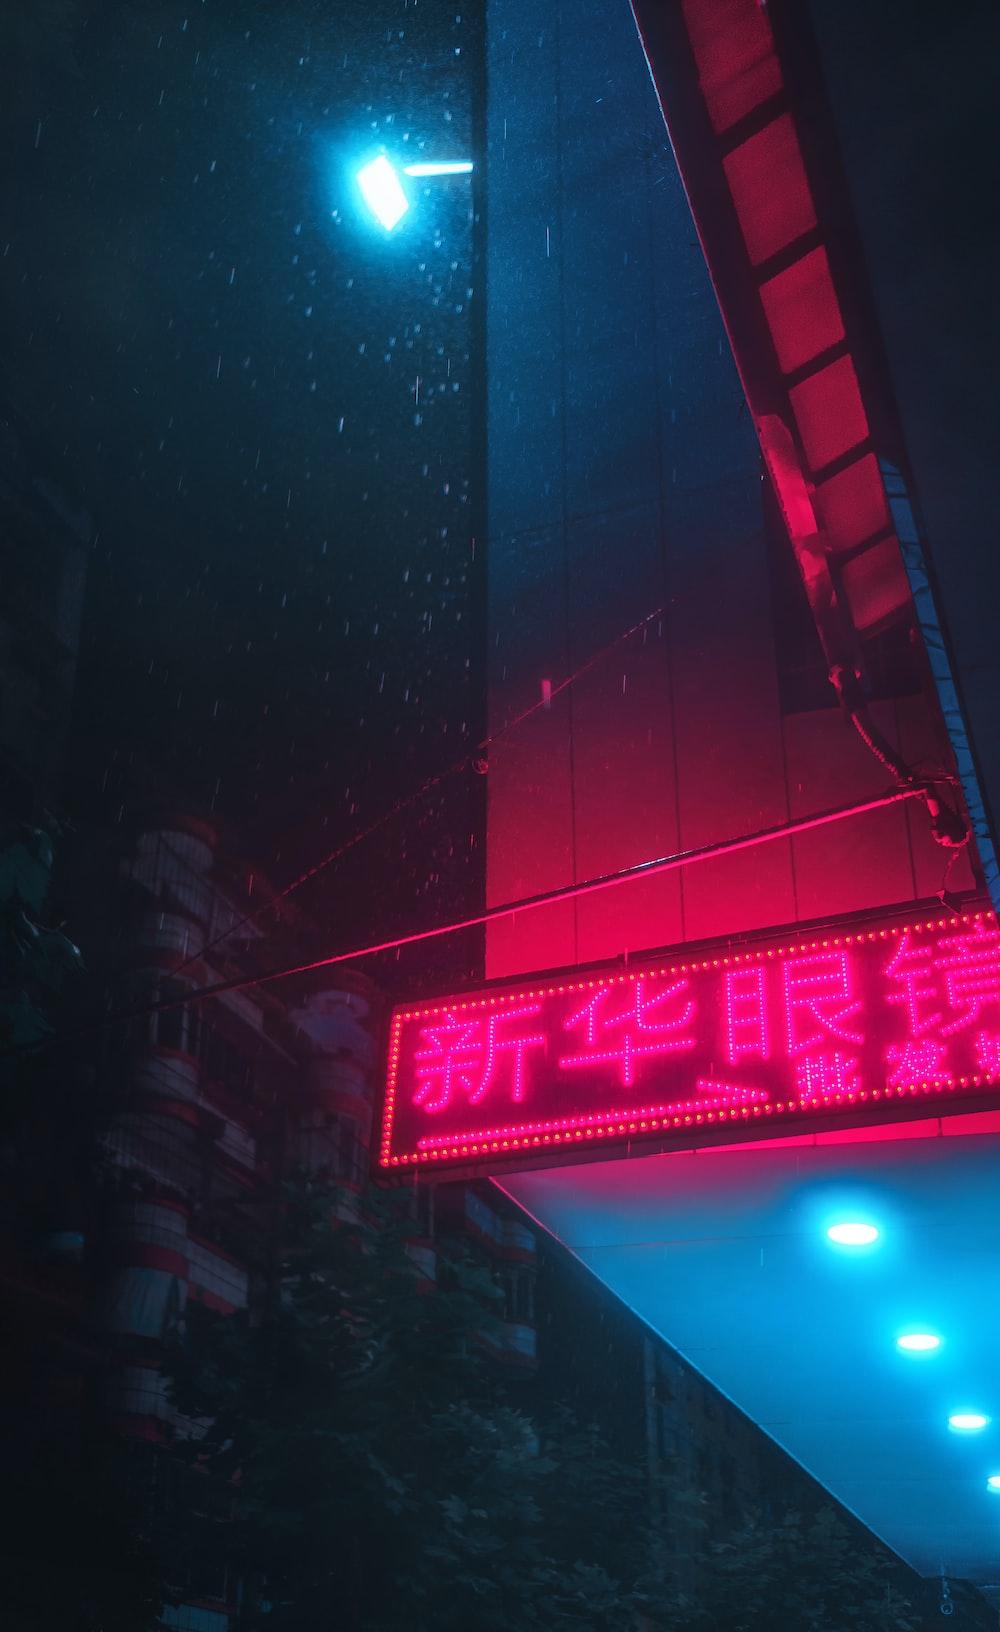 red neon light signage